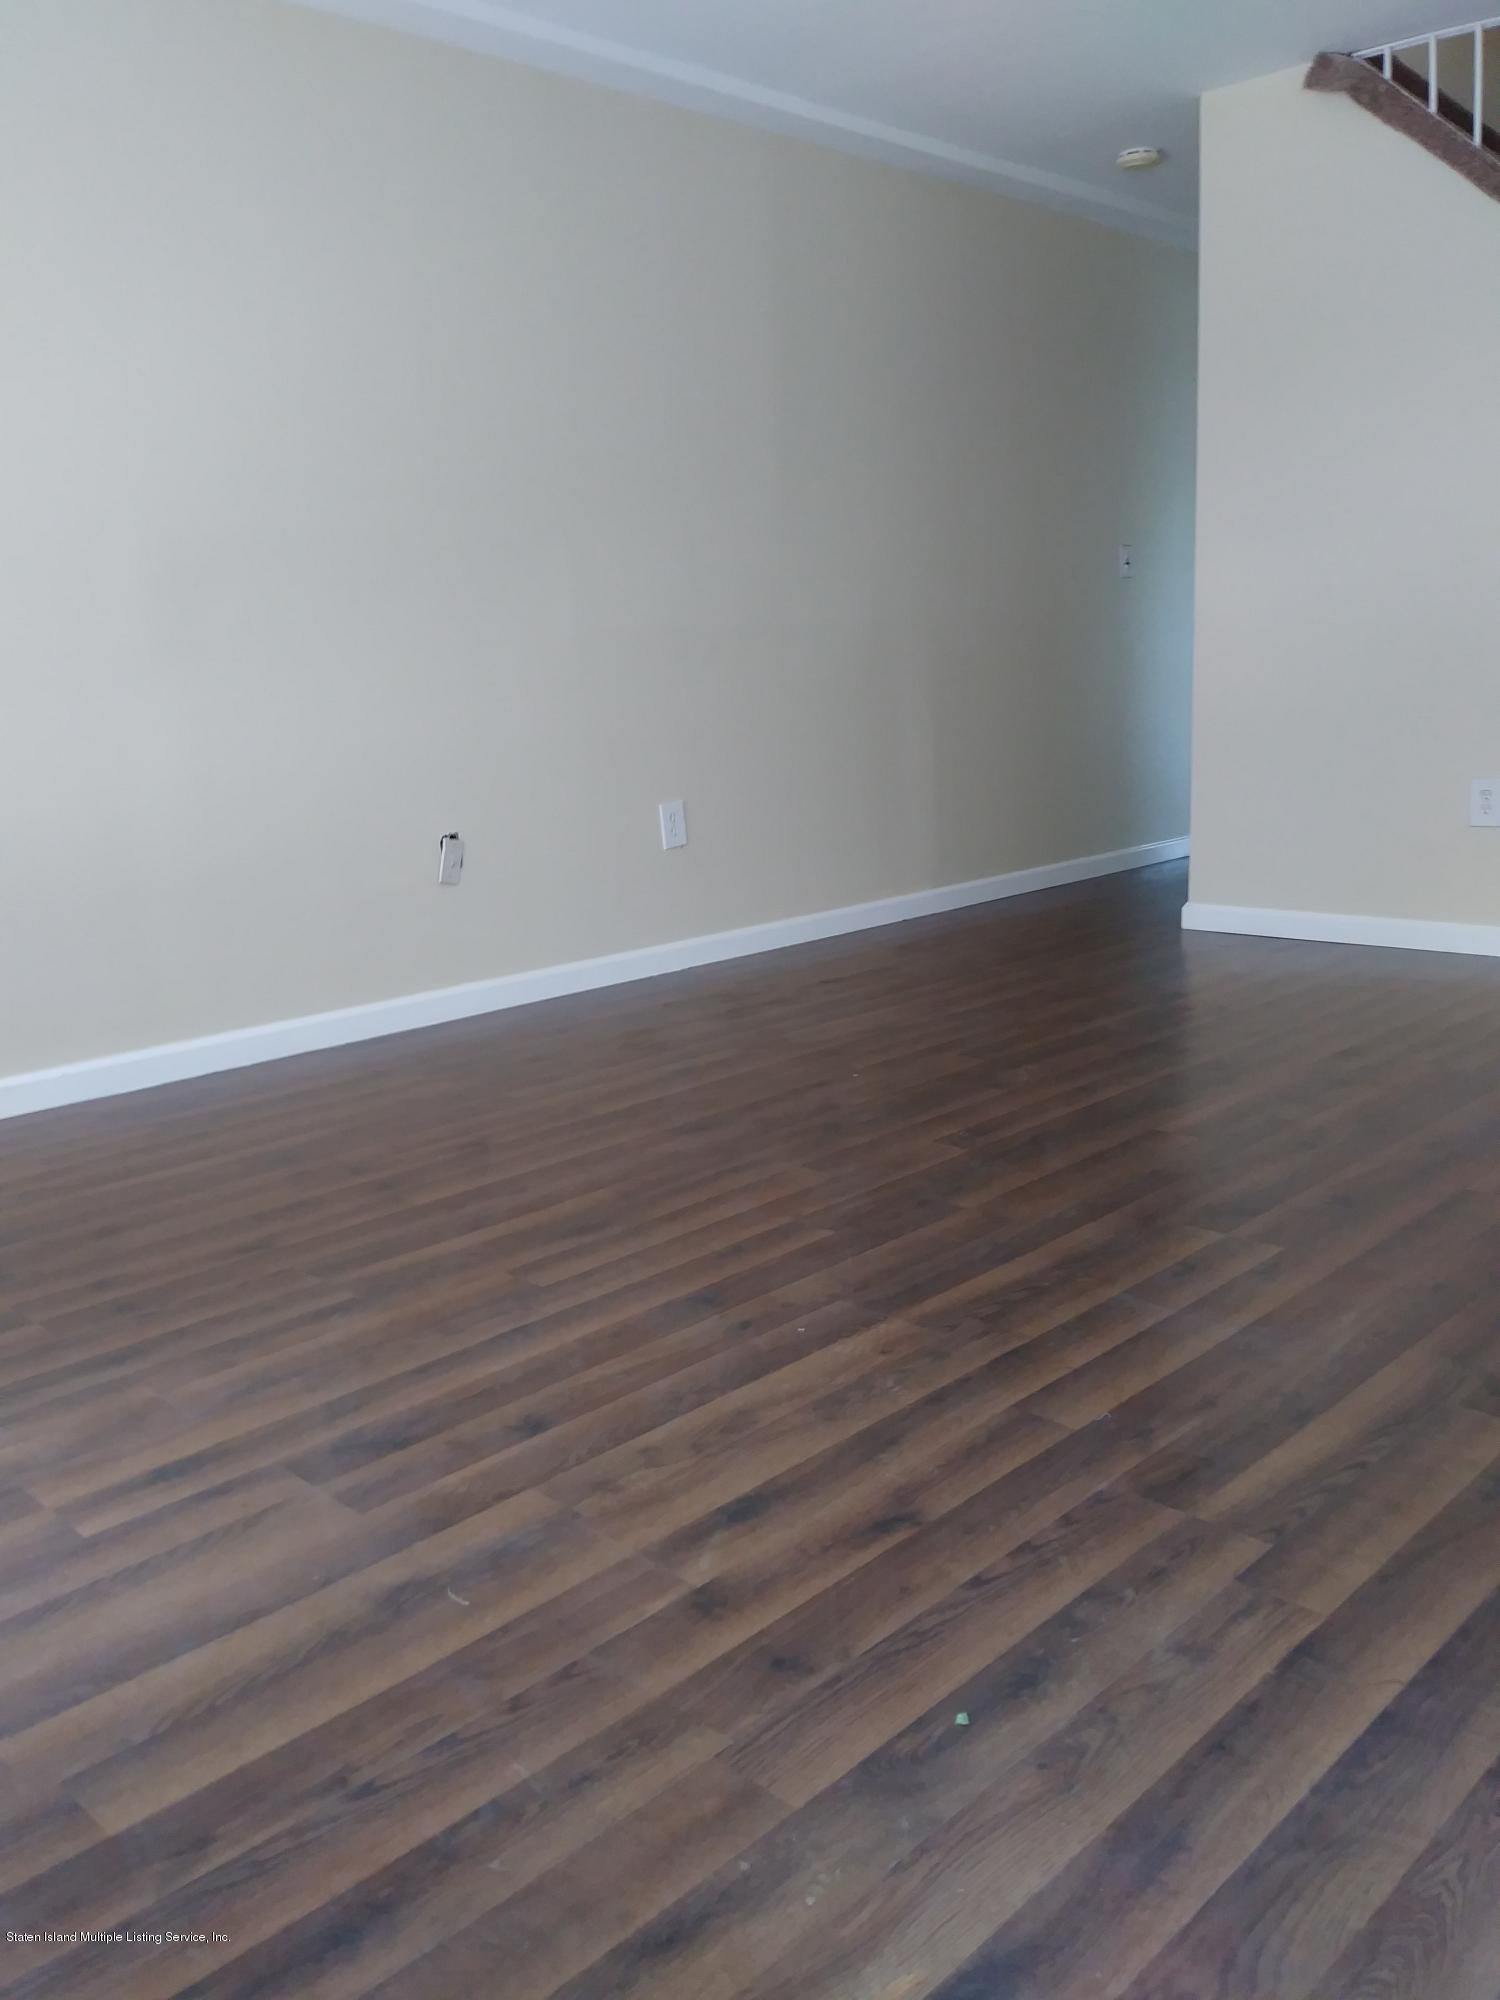 Single Family - Attached 221 Roma Avenue  Staten Island, NY 10306, MLS-1130351-6